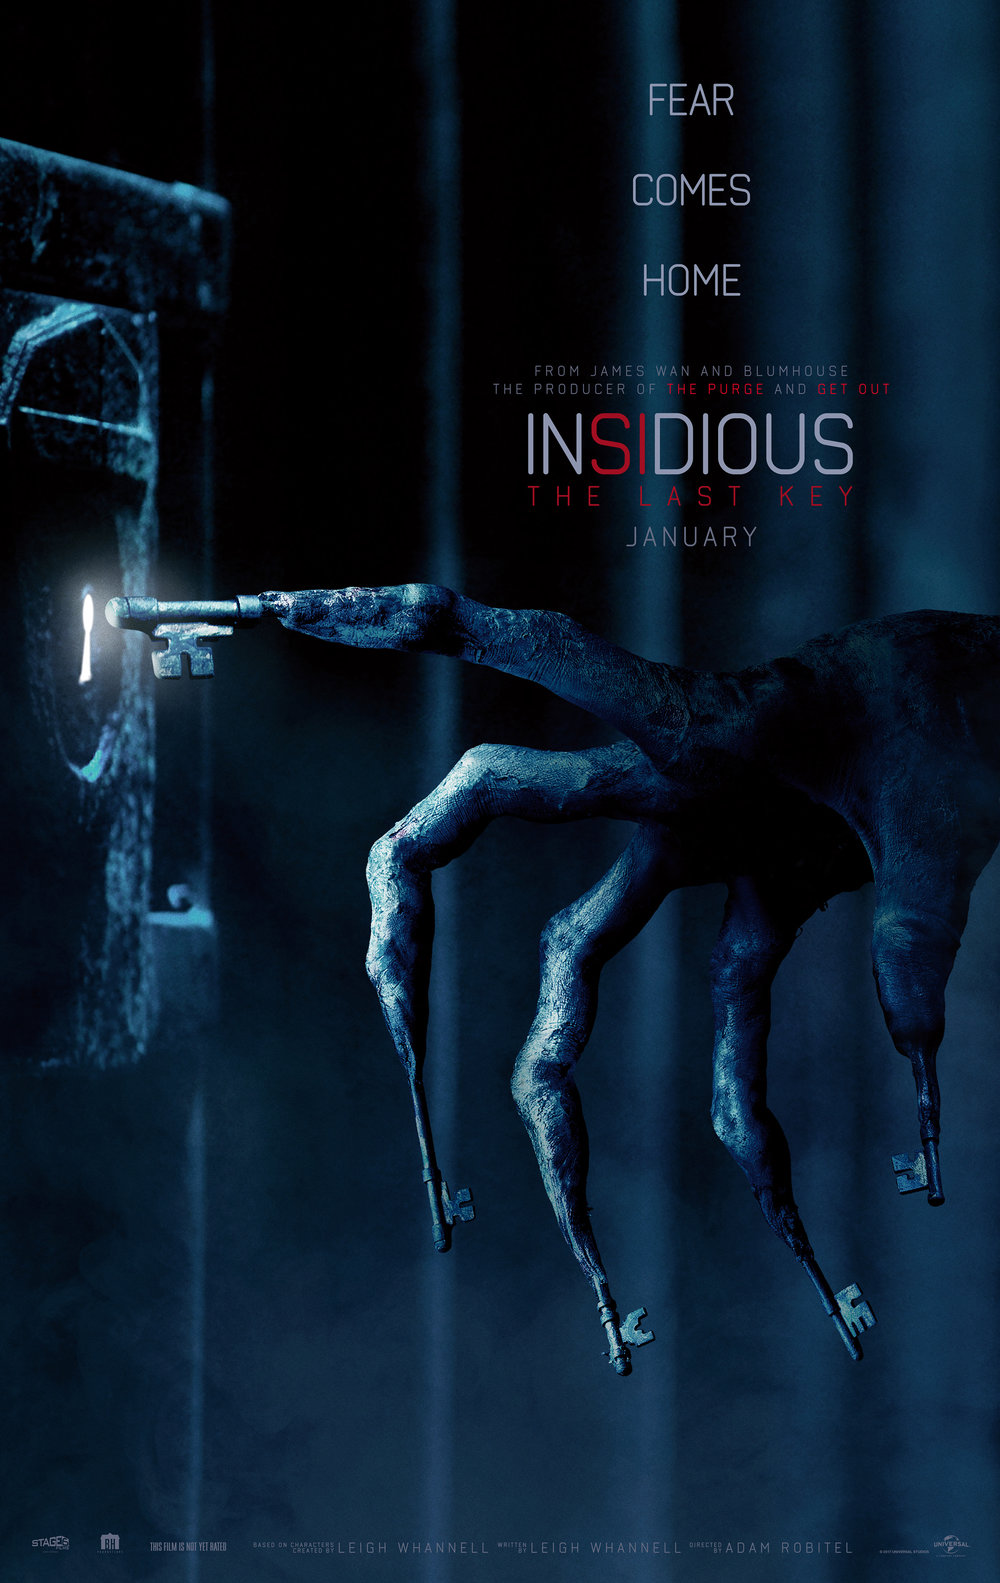 insidious-4-poster-large.jpg